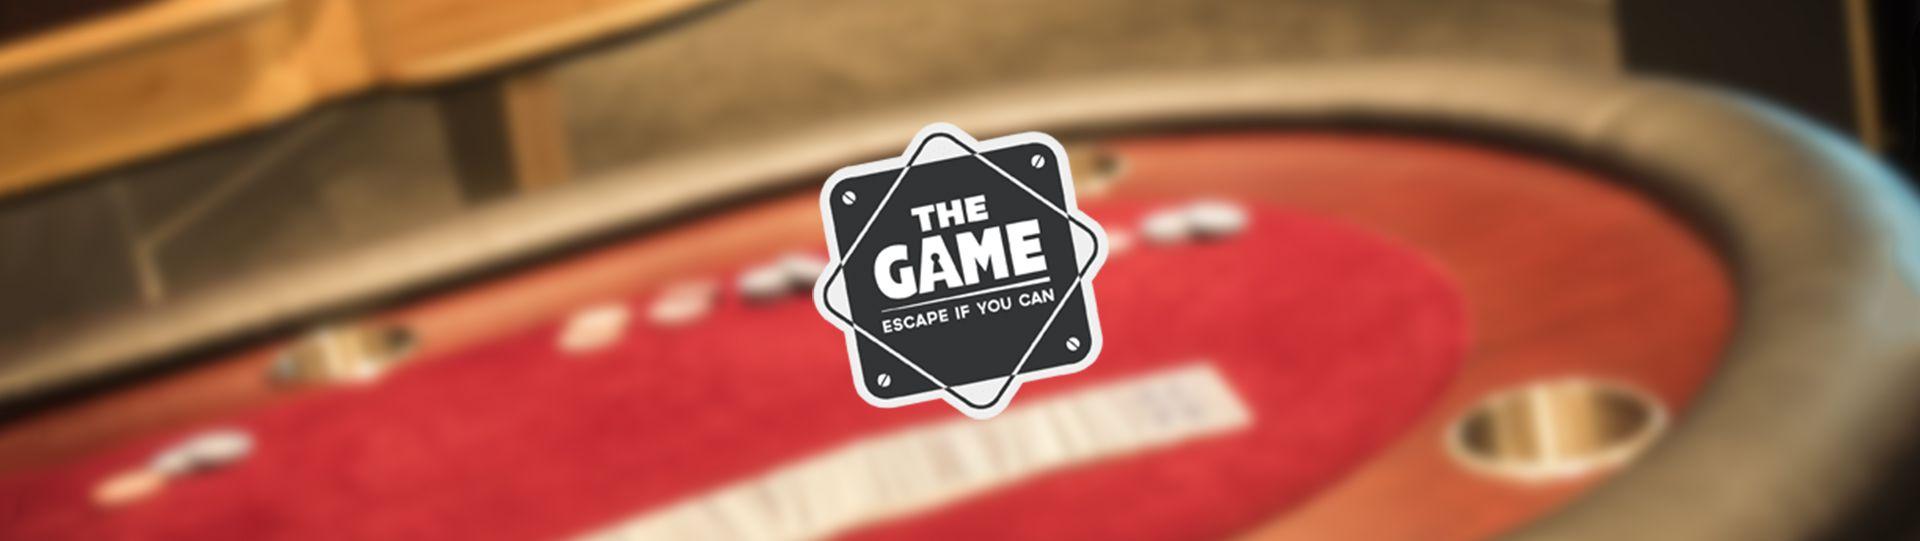 braquage du casino the game.jpg